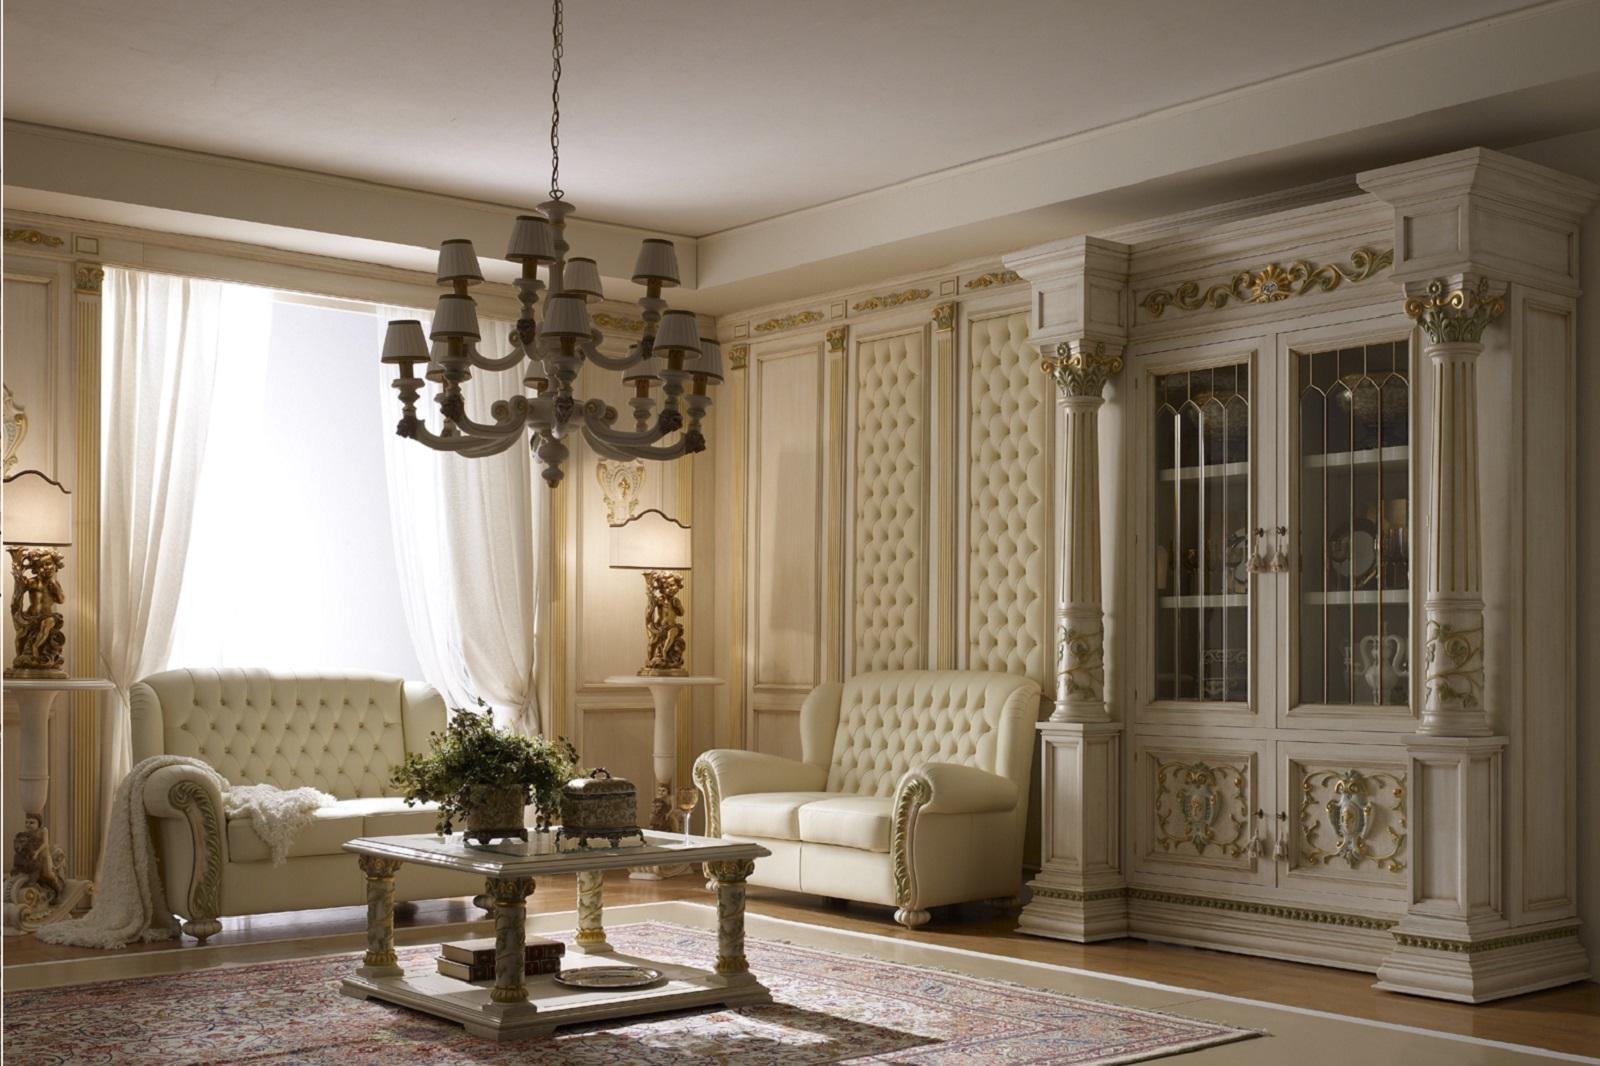 Ремонт домов и квартир Брянск